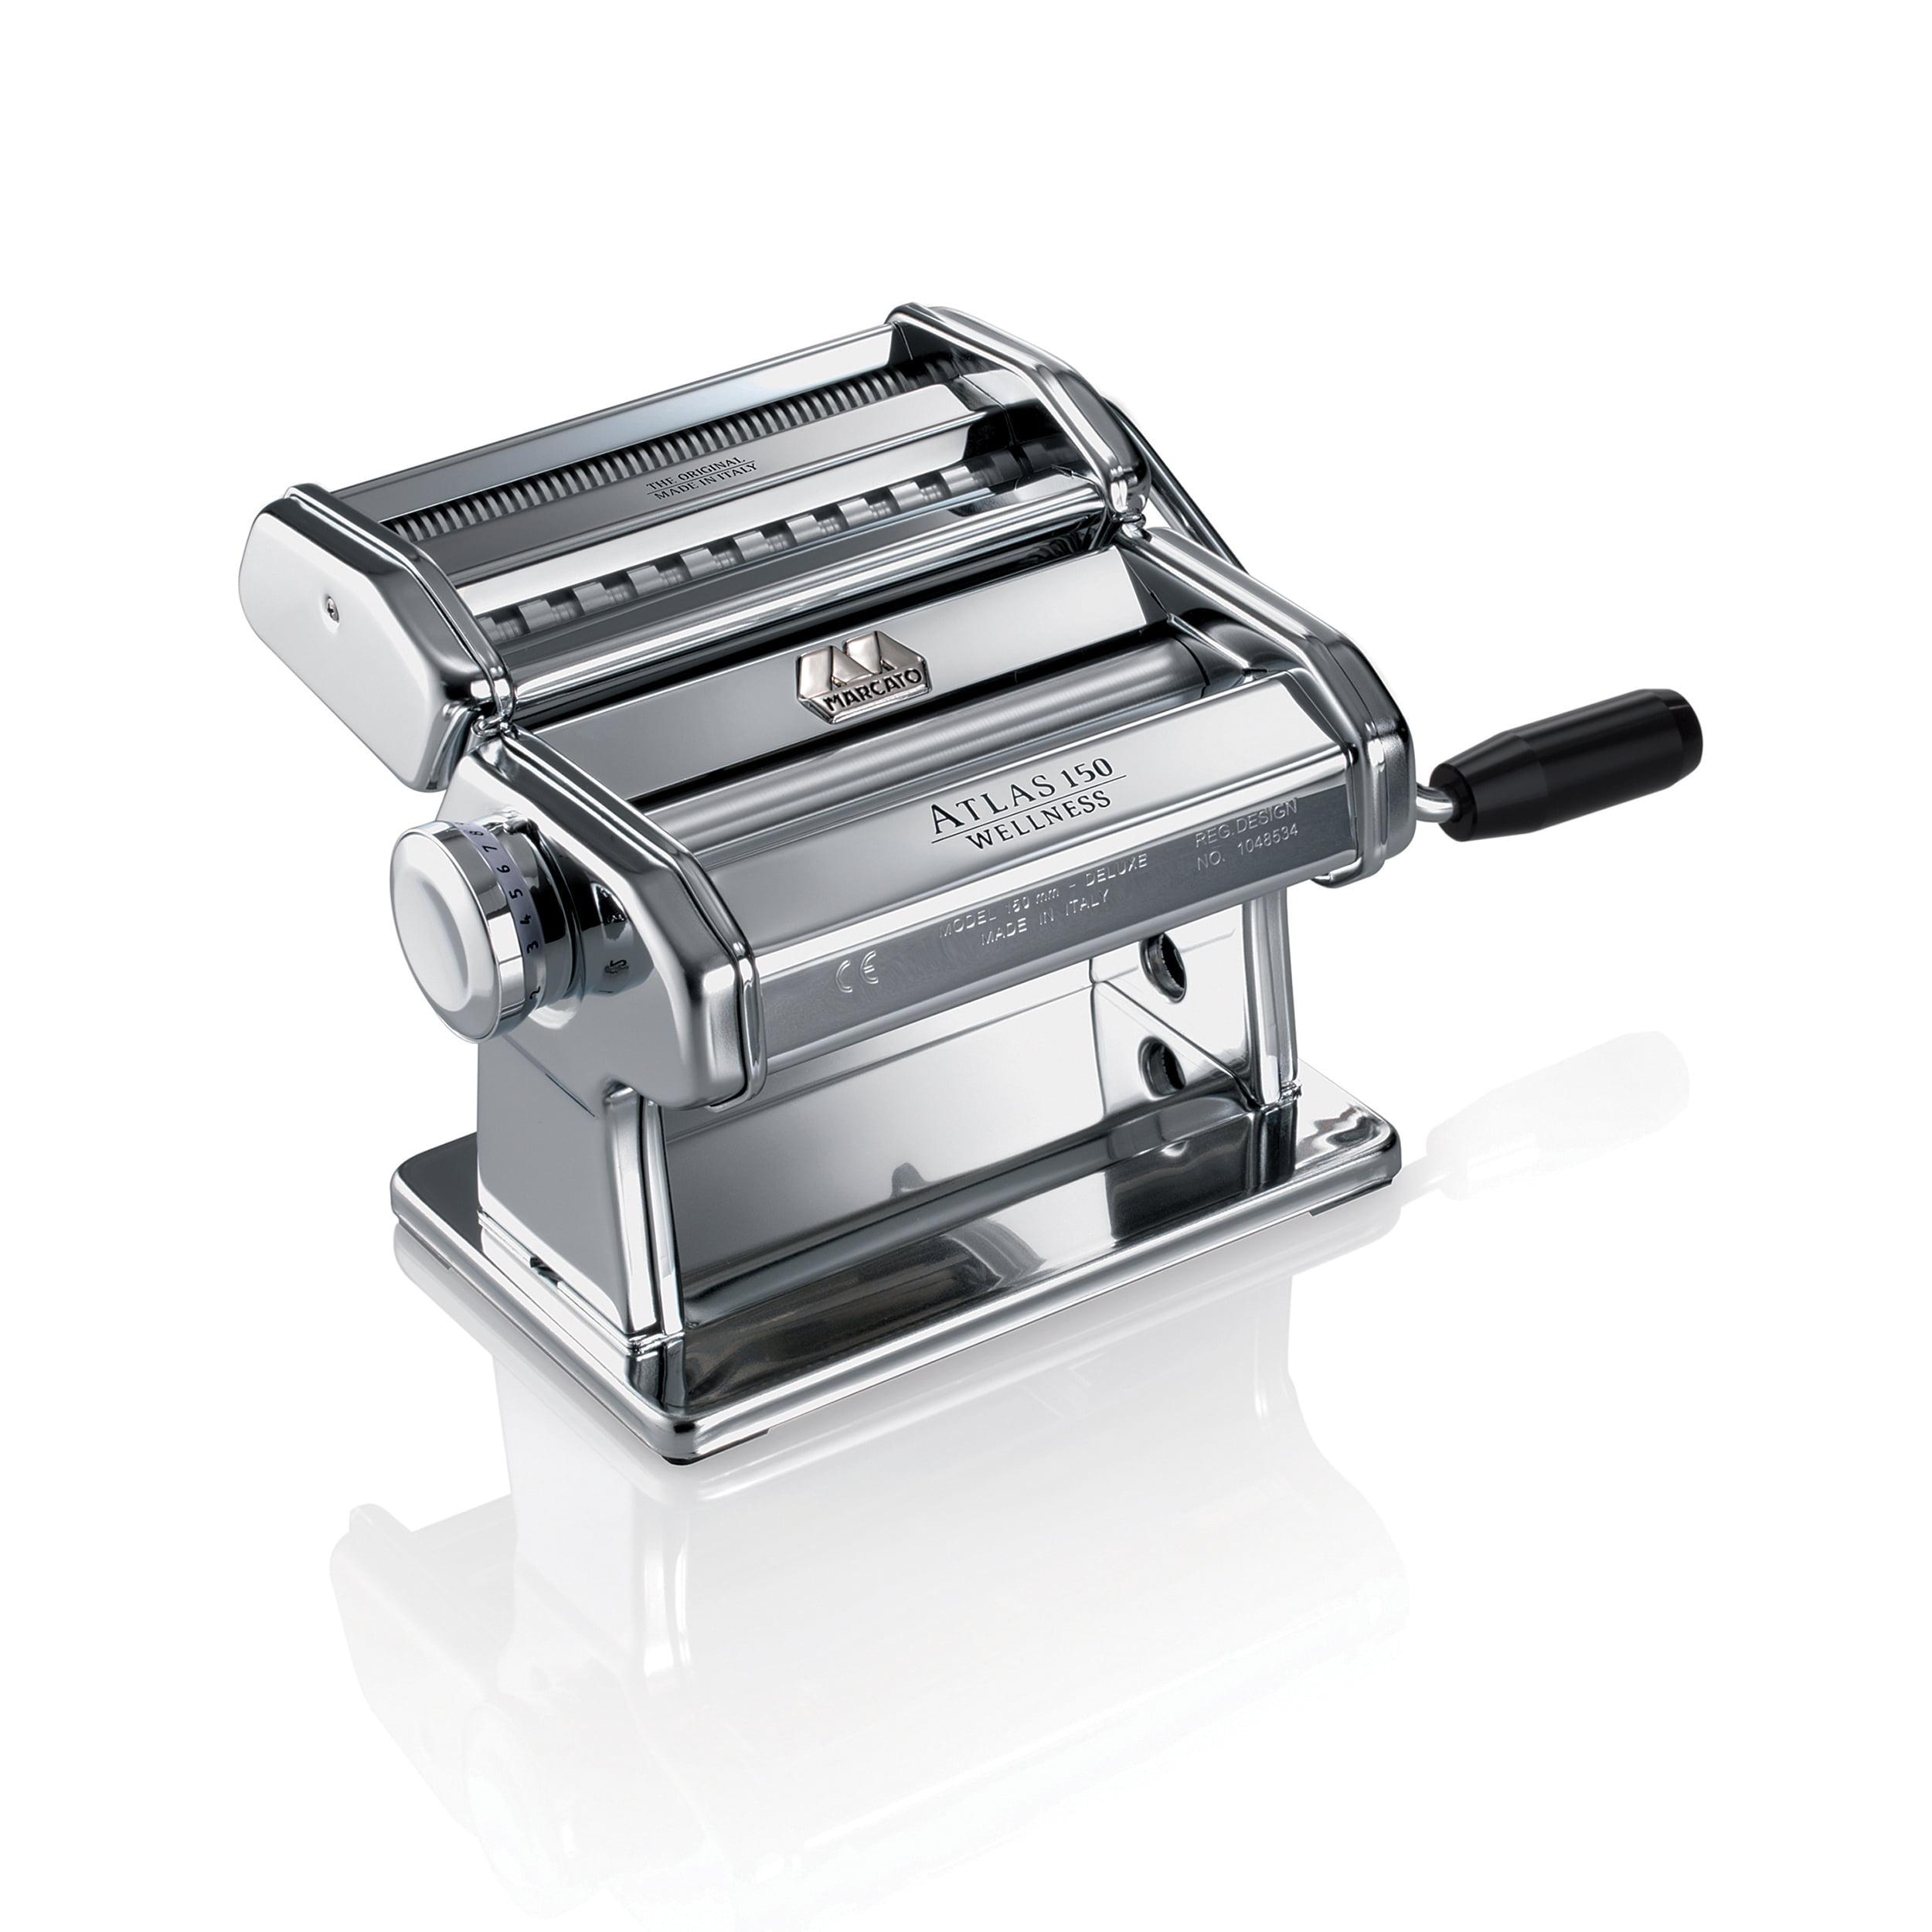 Best Pasta Machines - Marcato Atlas 150 Pasta Machine, Chrome Review